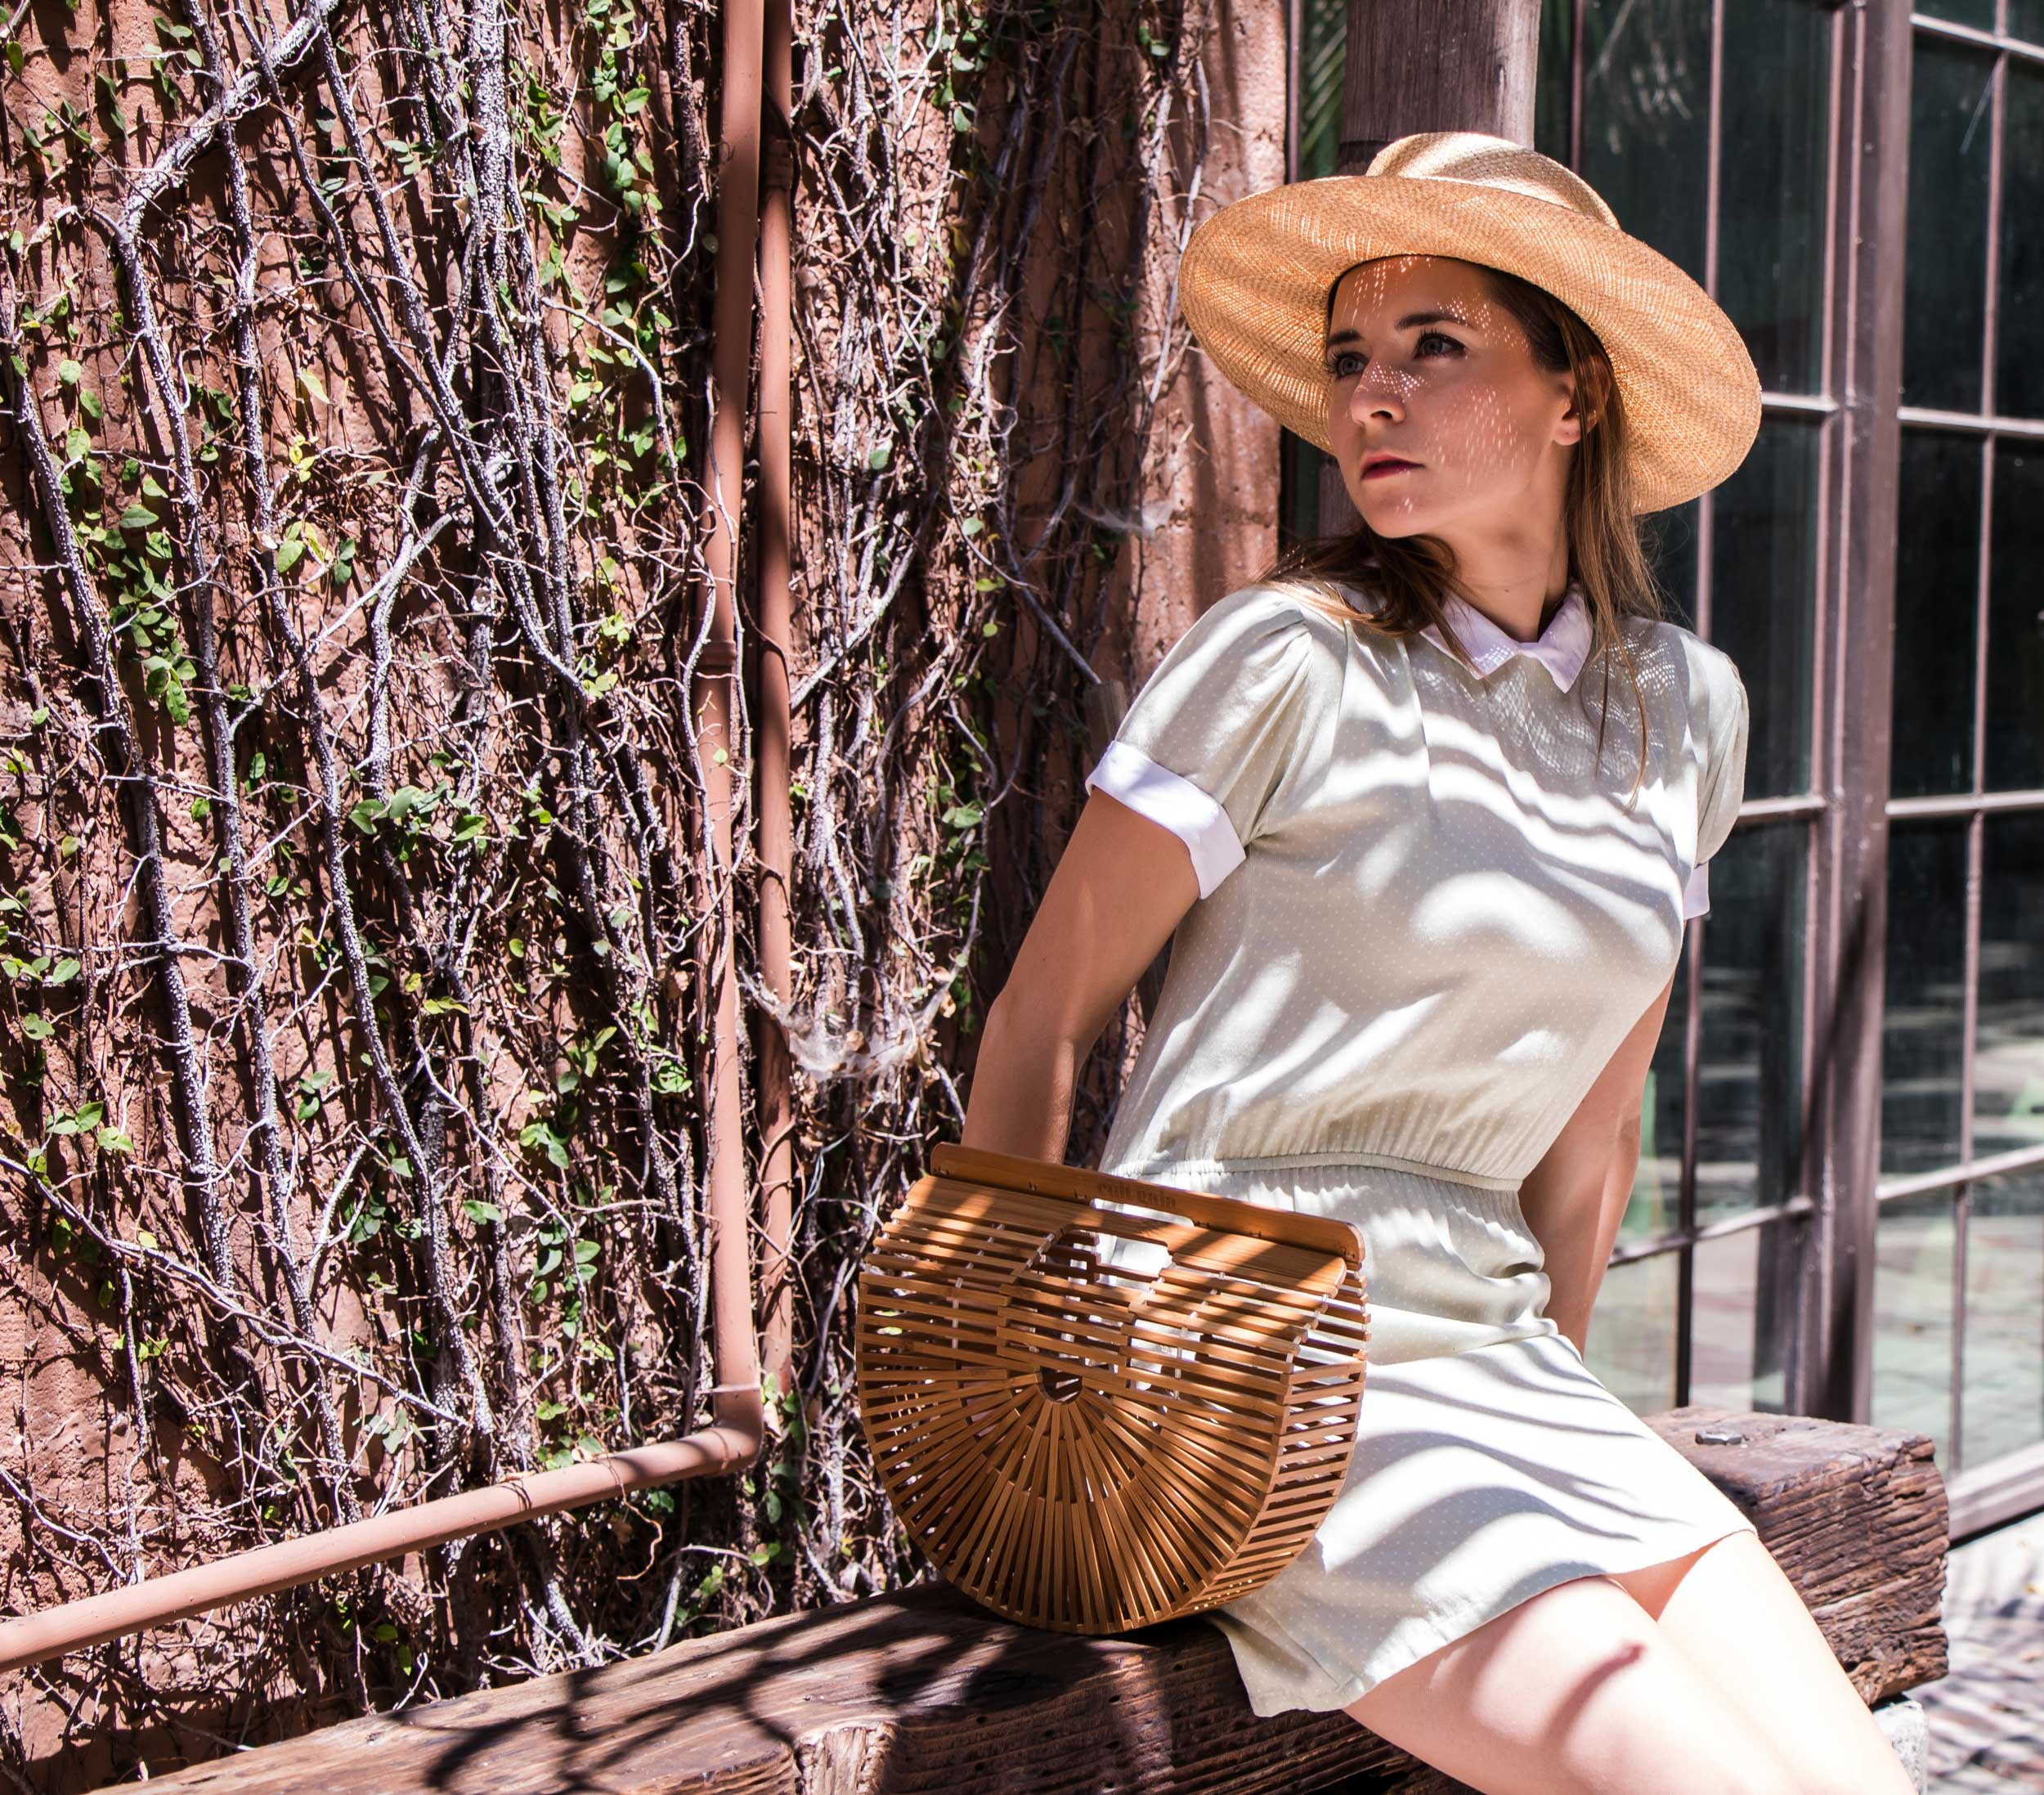 LA Shop Local - Christy Dawn - Cult Gaia - Janessa Leone - More on Modersvp.com